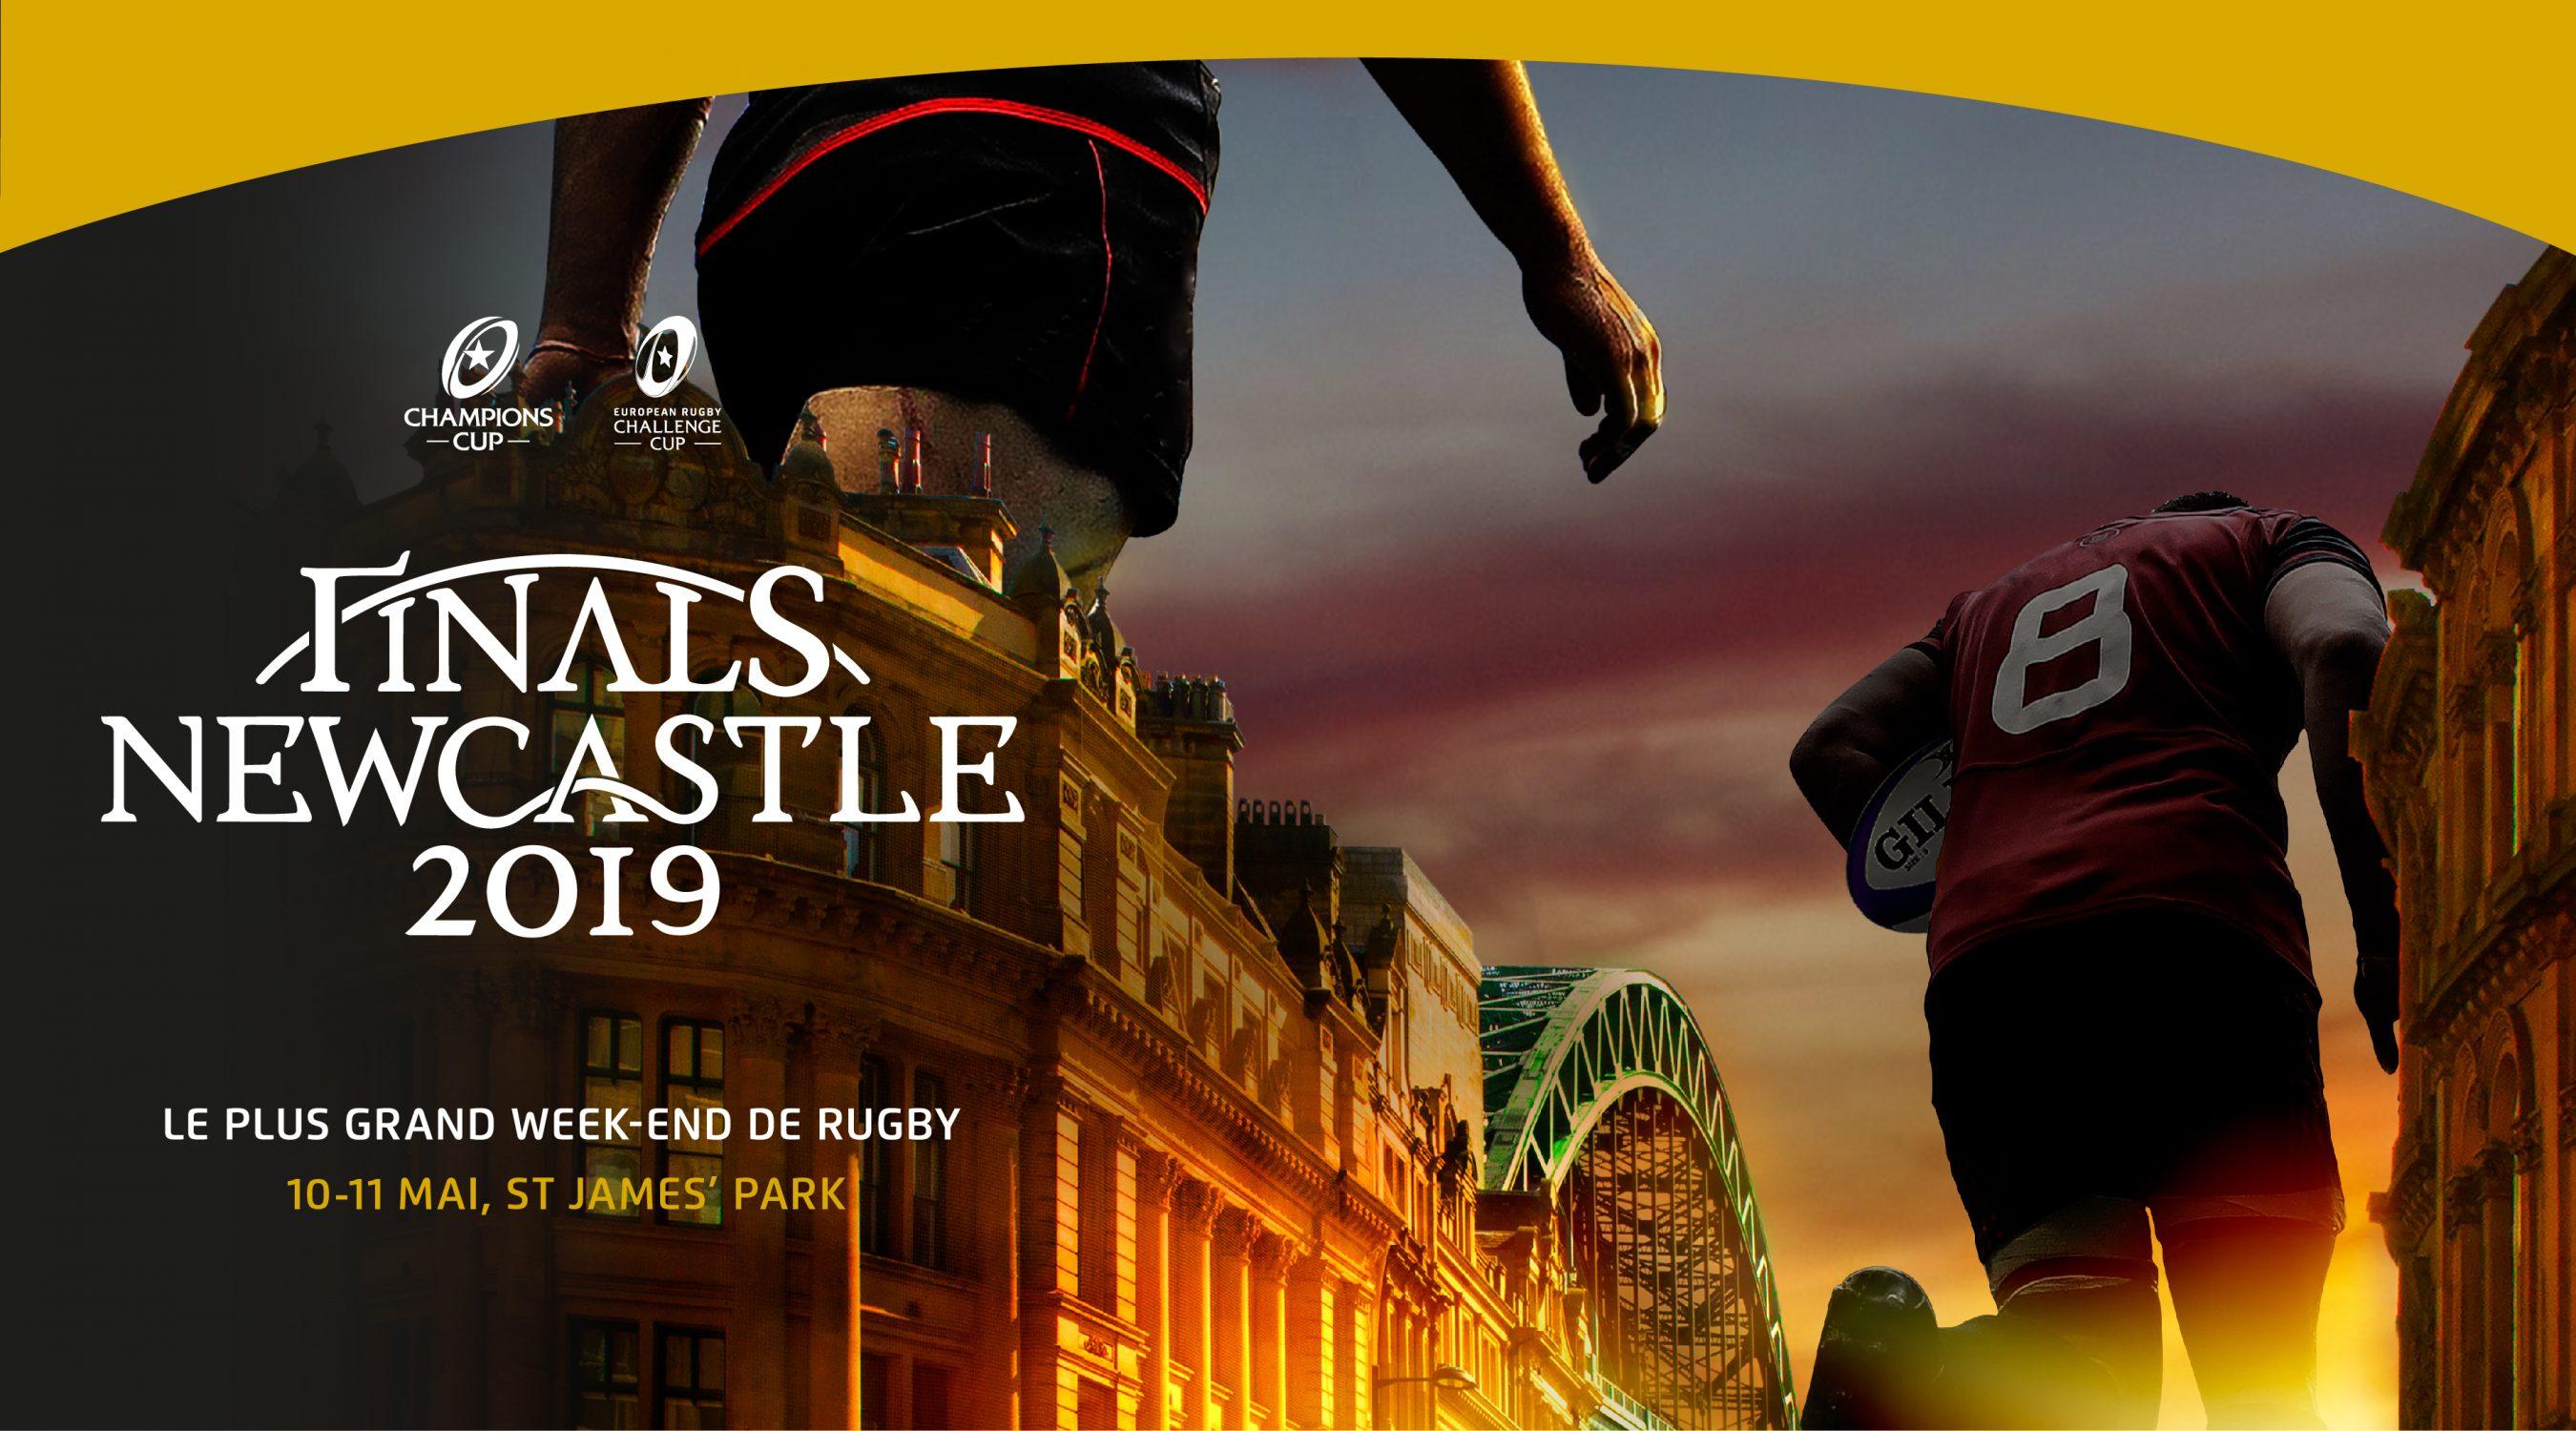 Finales Newcastle 2019